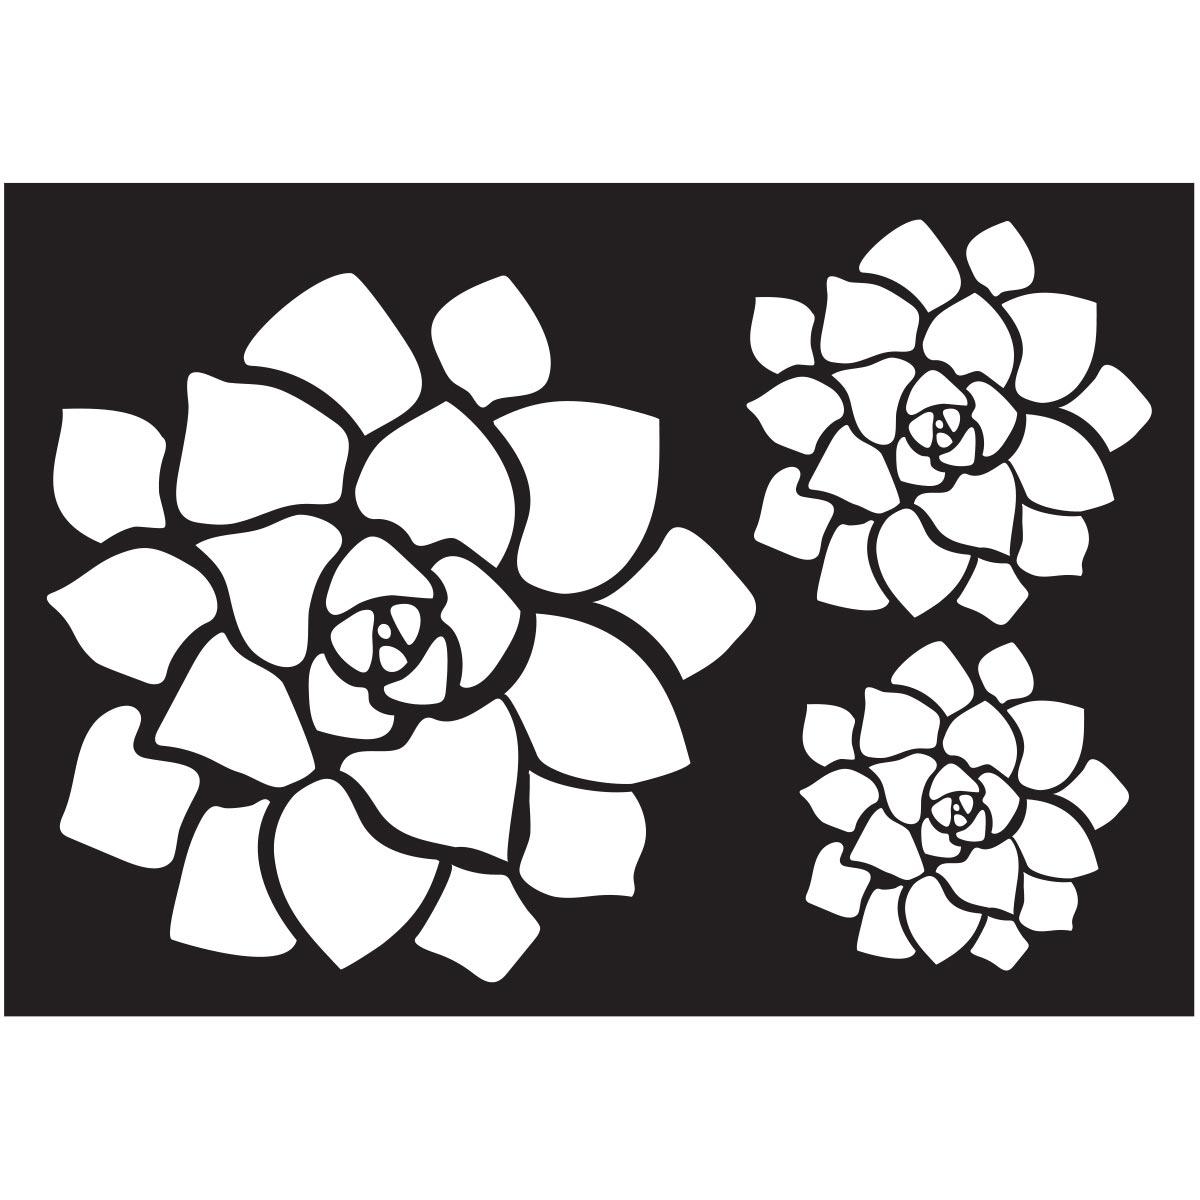 FolkArt ® Painting Stencils - Succulent Motif